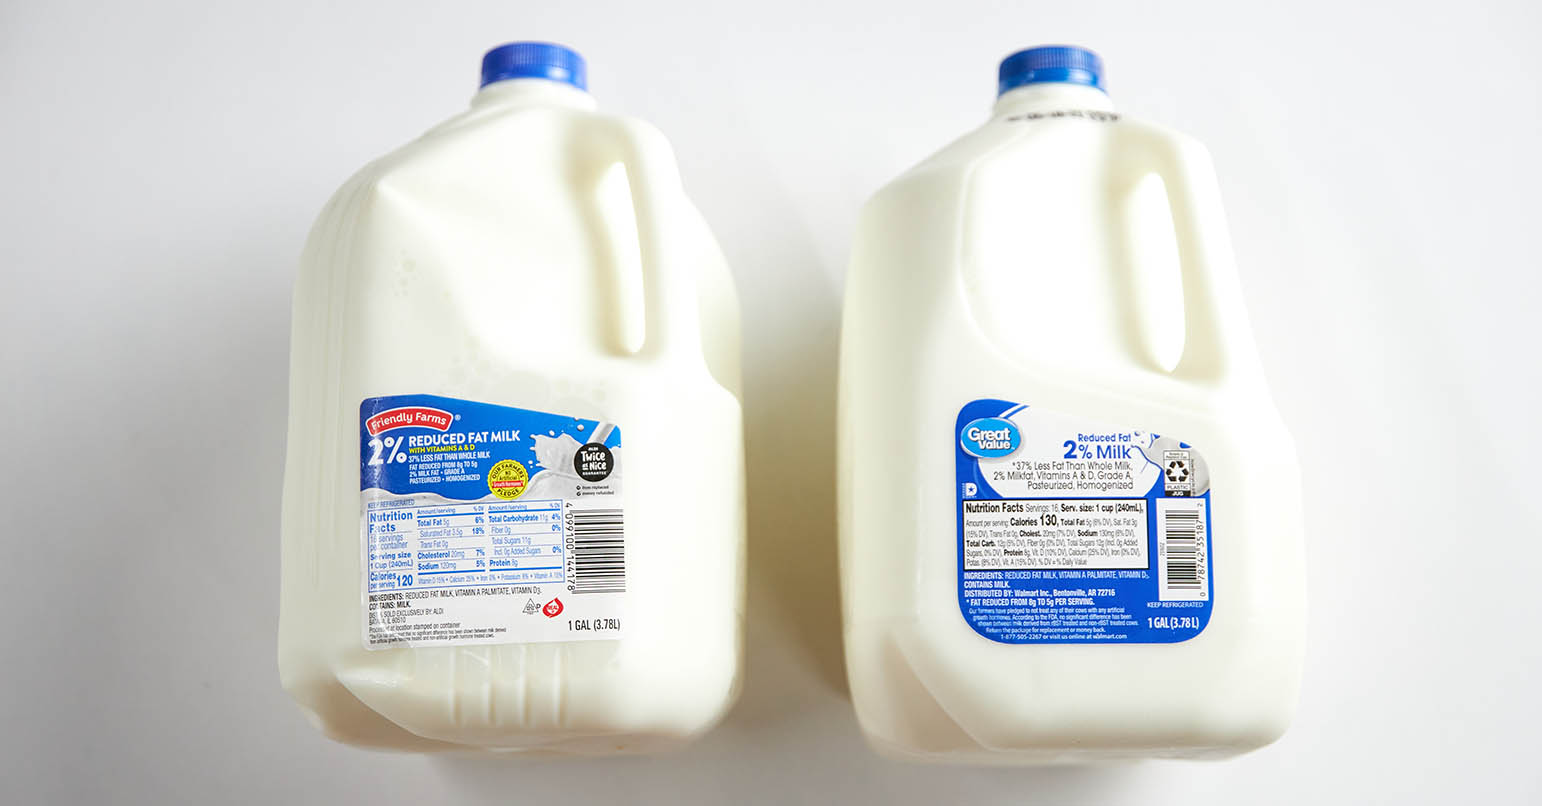 Aldi vs Walmart Milk